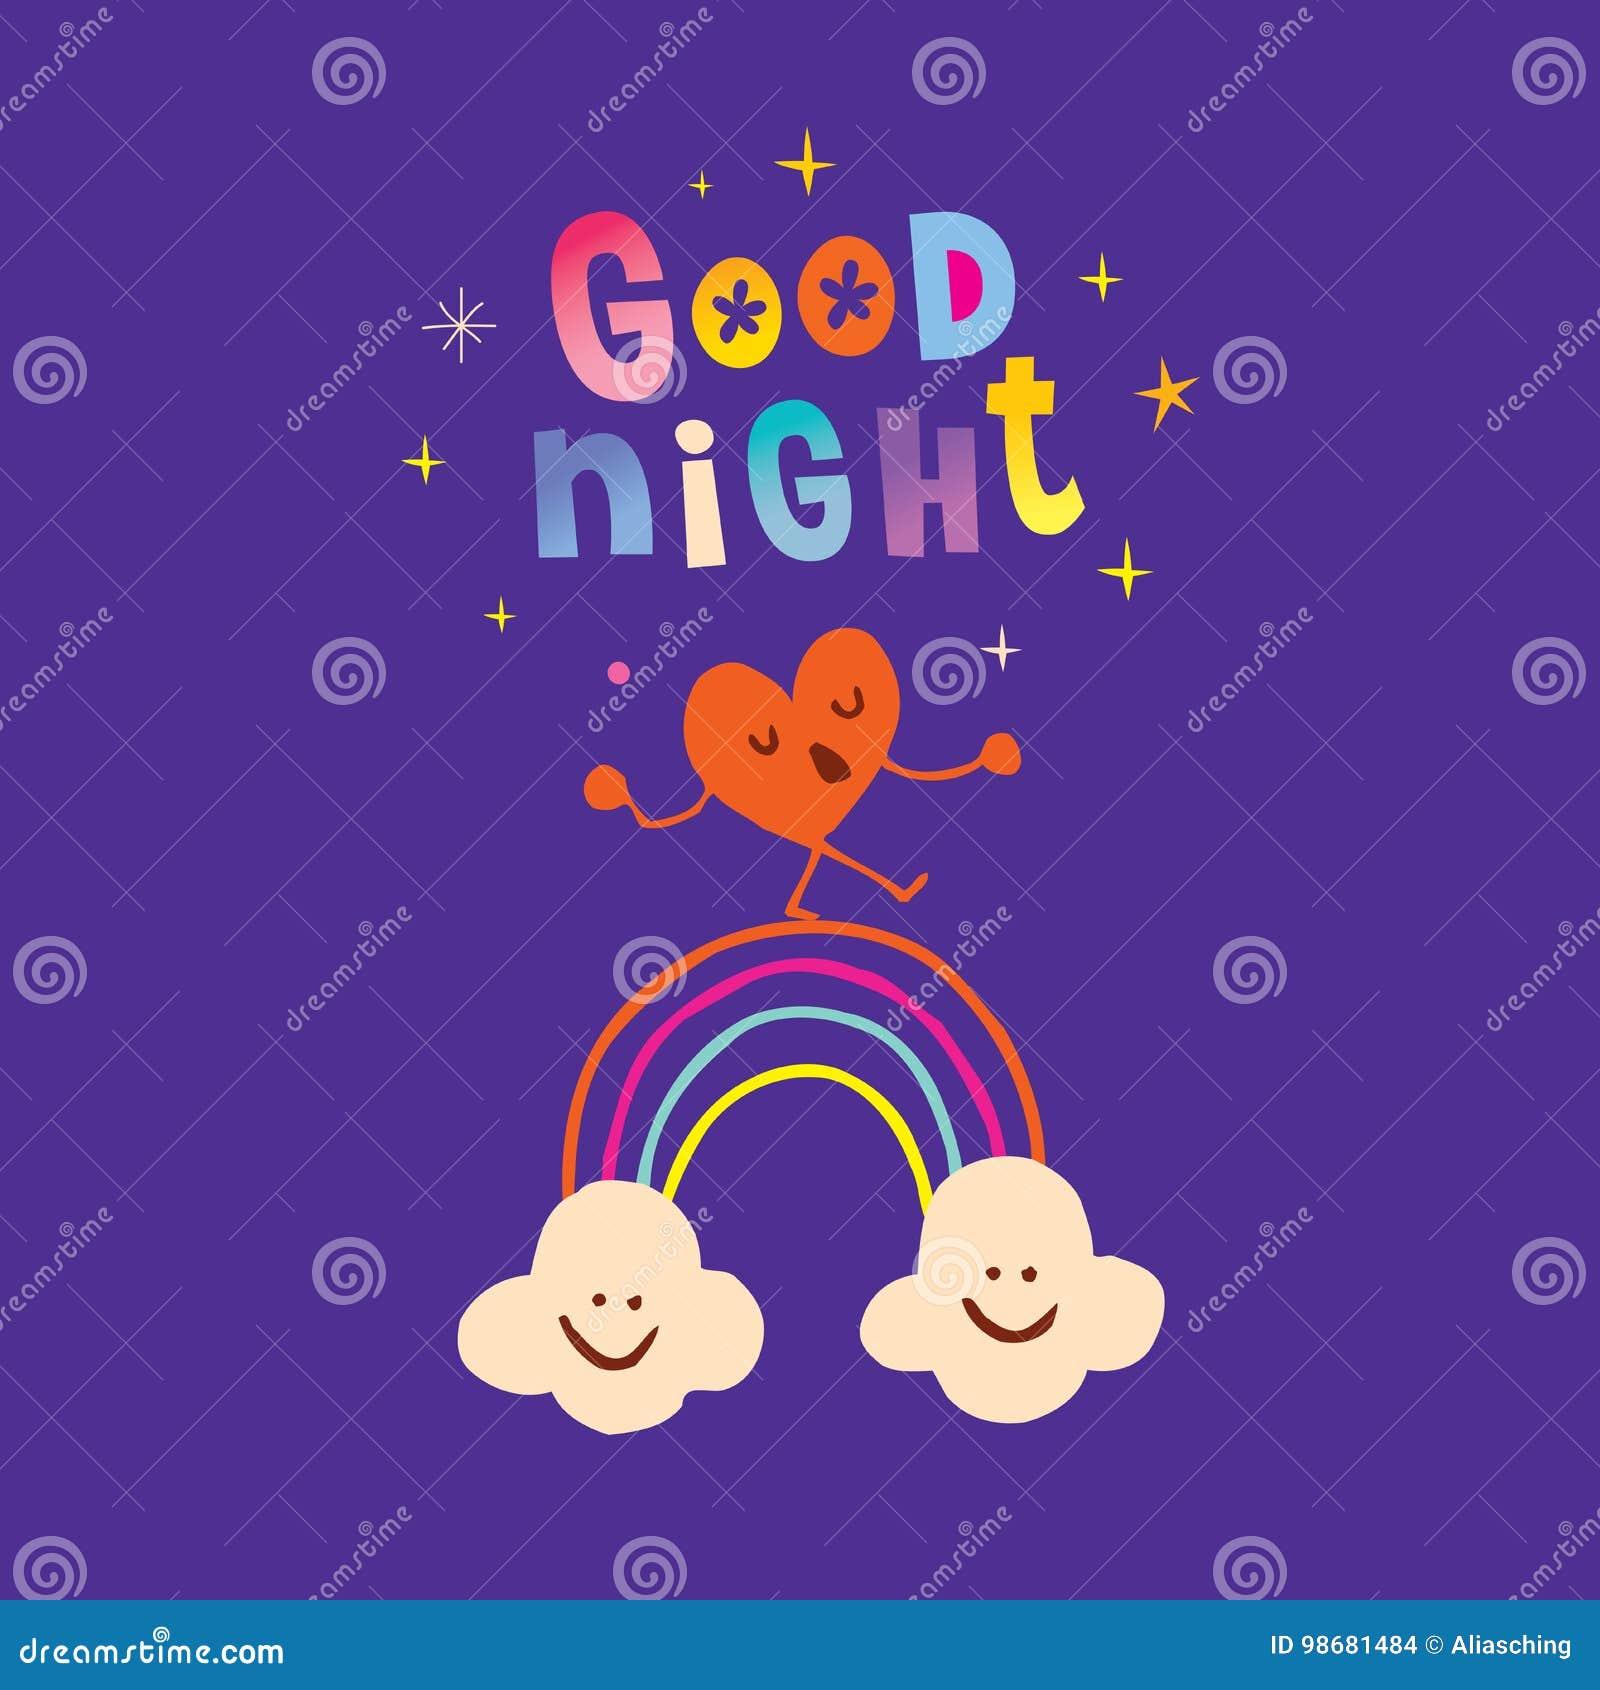 Good Night Stock Vector Illustration Of Smile Goodnight 98681484